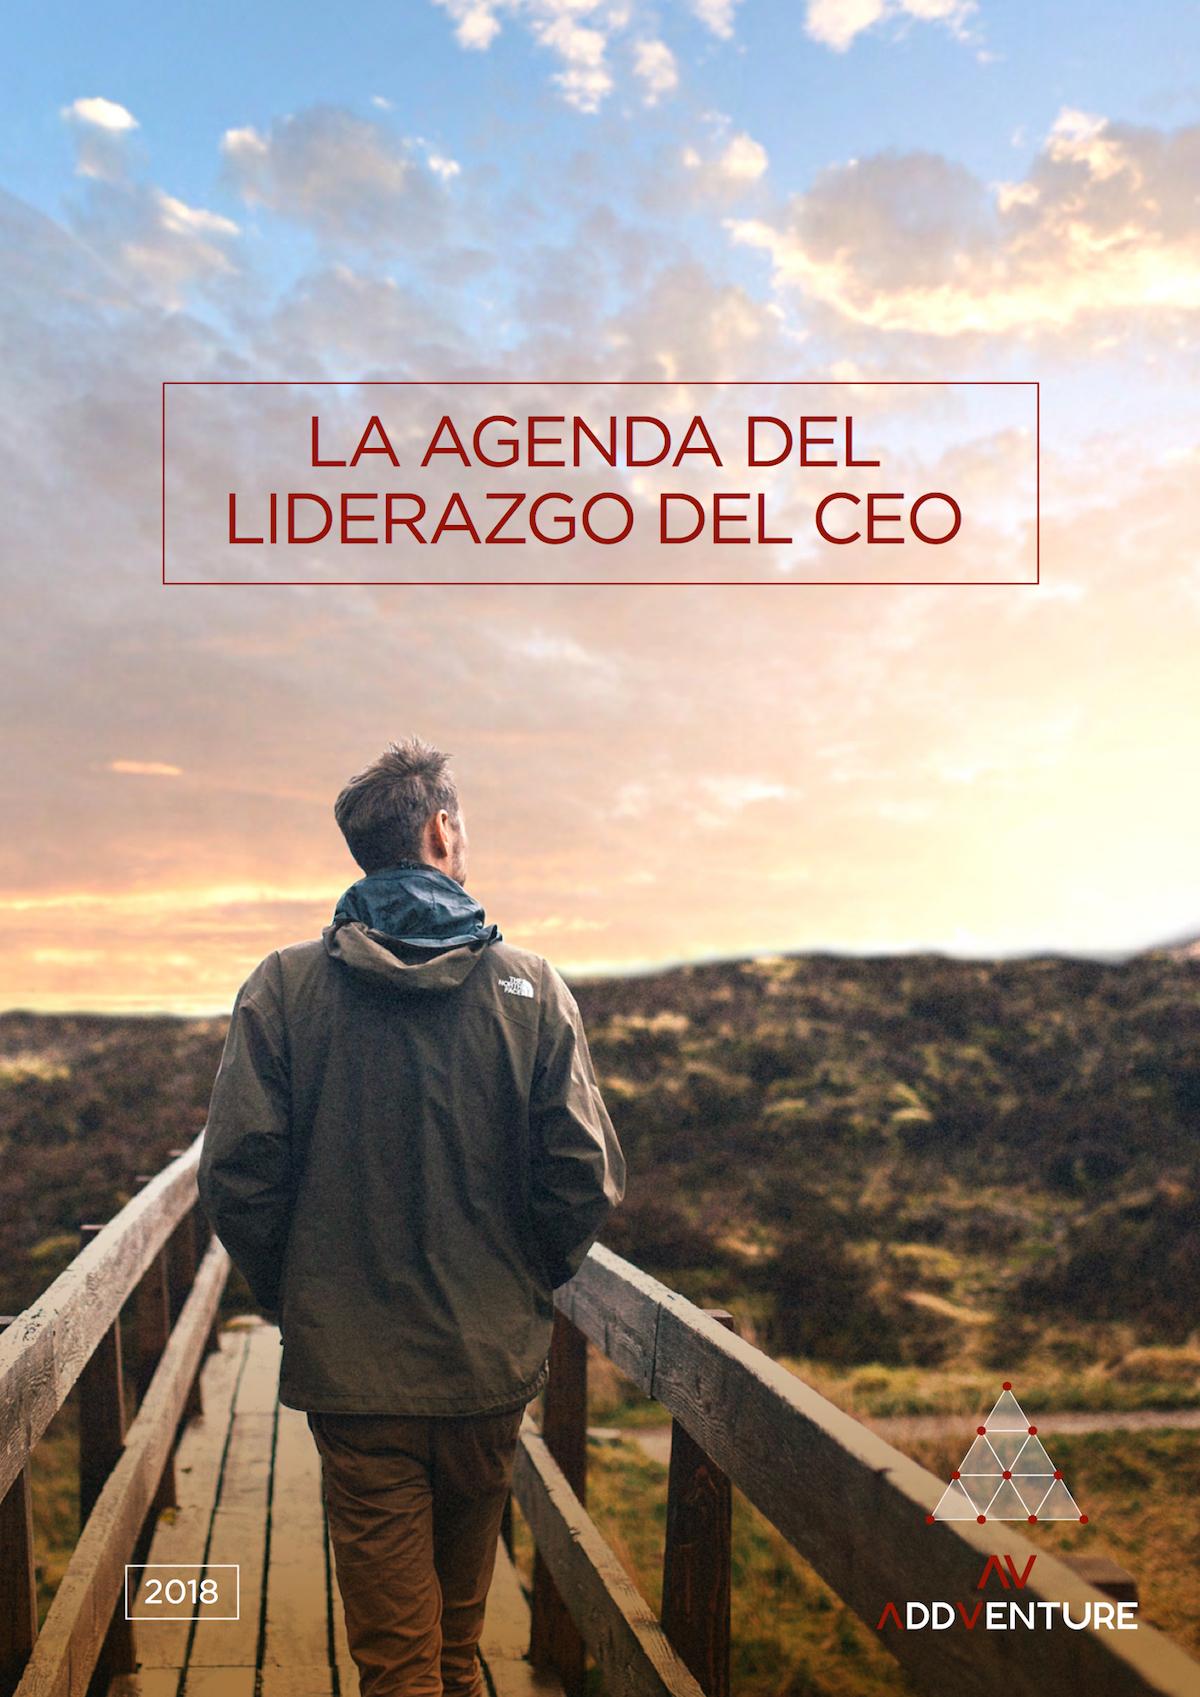 La agenda del liderazgo del CEO - AddVenture - autor: Pablo Tovar